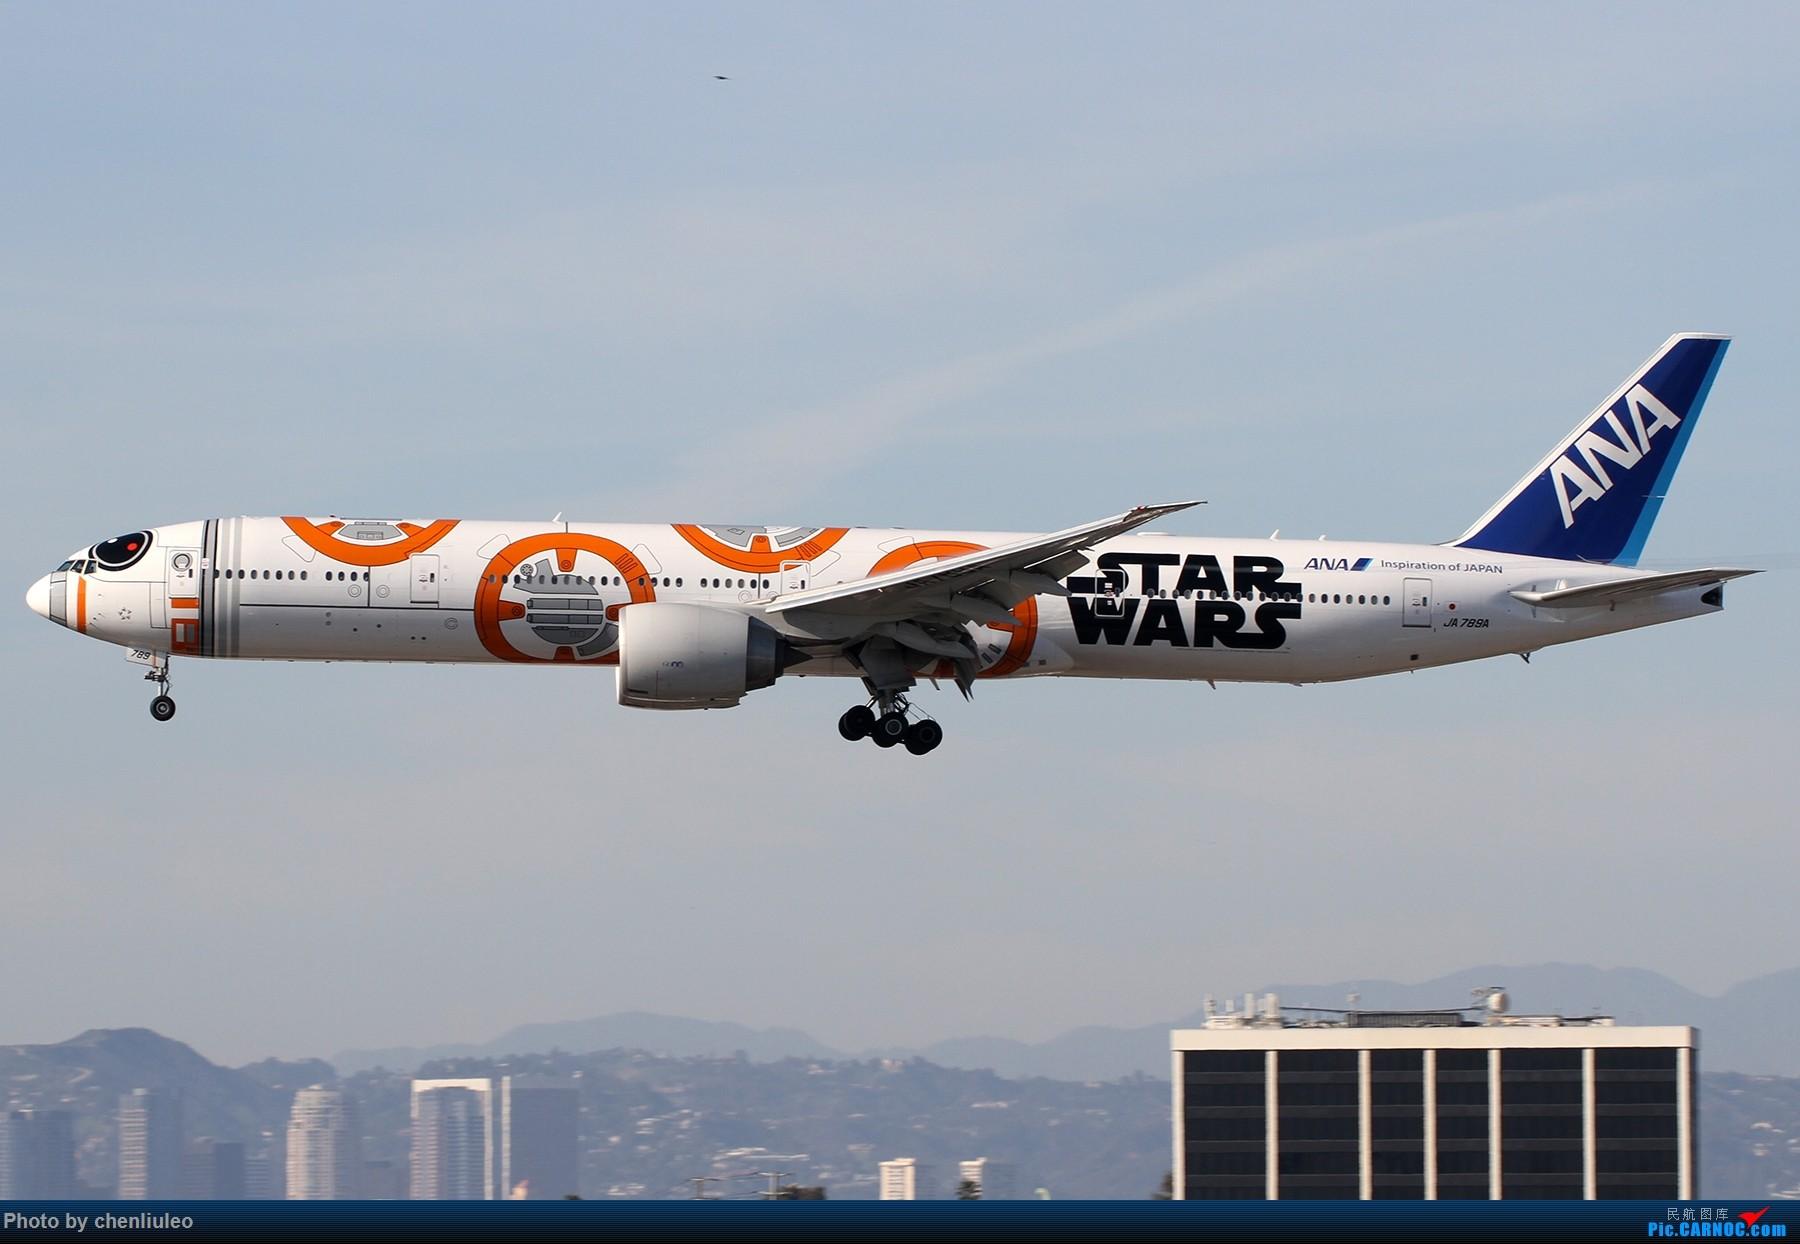 Re:[原创]【北美飞友会】全日空星球大战BB-8黄昏中降落LAX 以及一些杂图 BOEING 777-300ER JA789A 美国洛杉矶机场